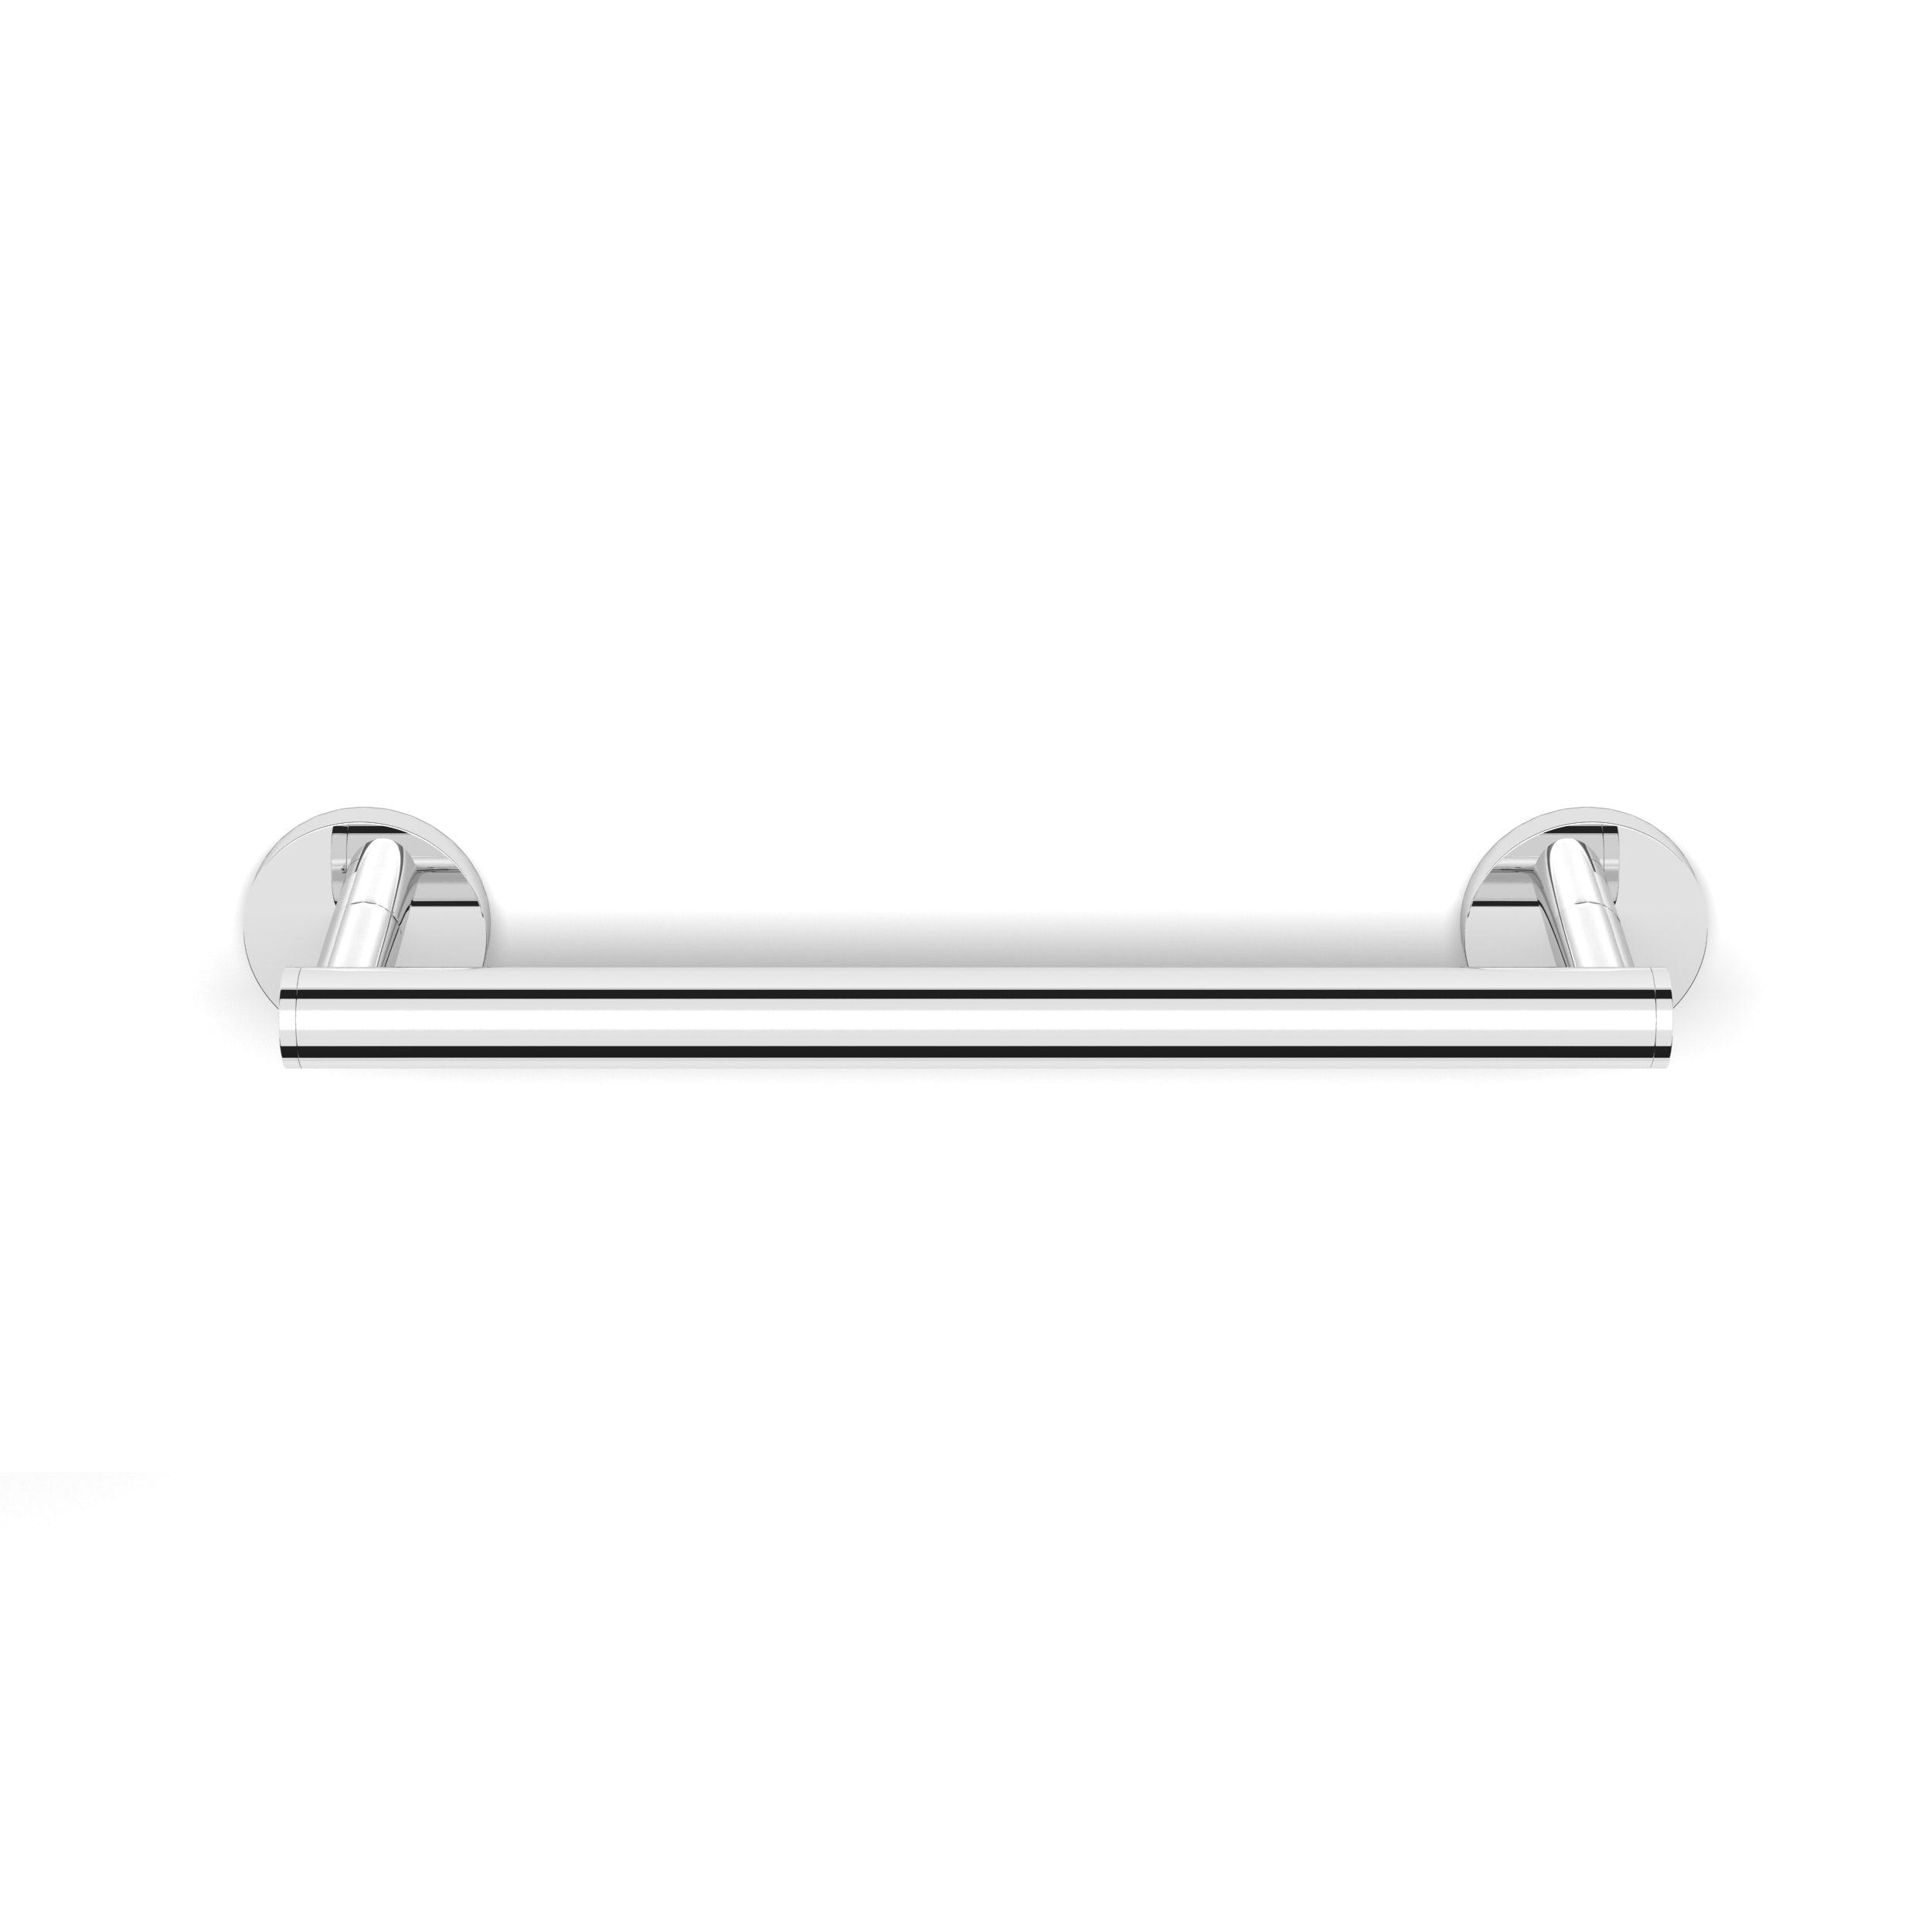 AKW Velena radius straight grab rail 300mm - Sold by Victoria Plum